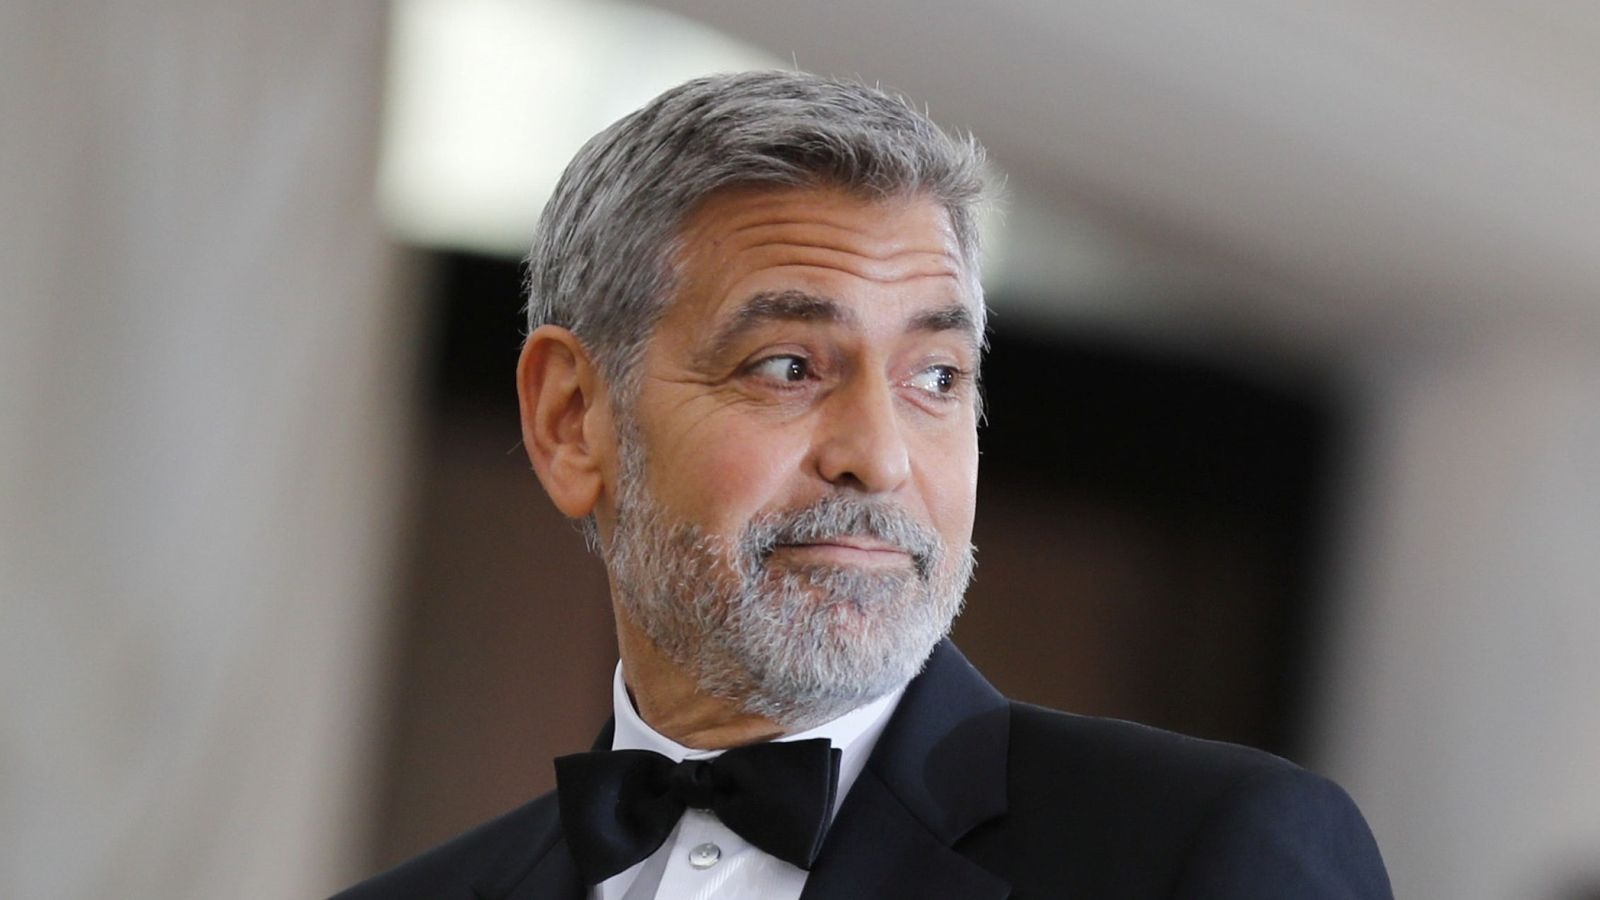 Foto: George Clooney, en una imagen de archivo. (Reuters)